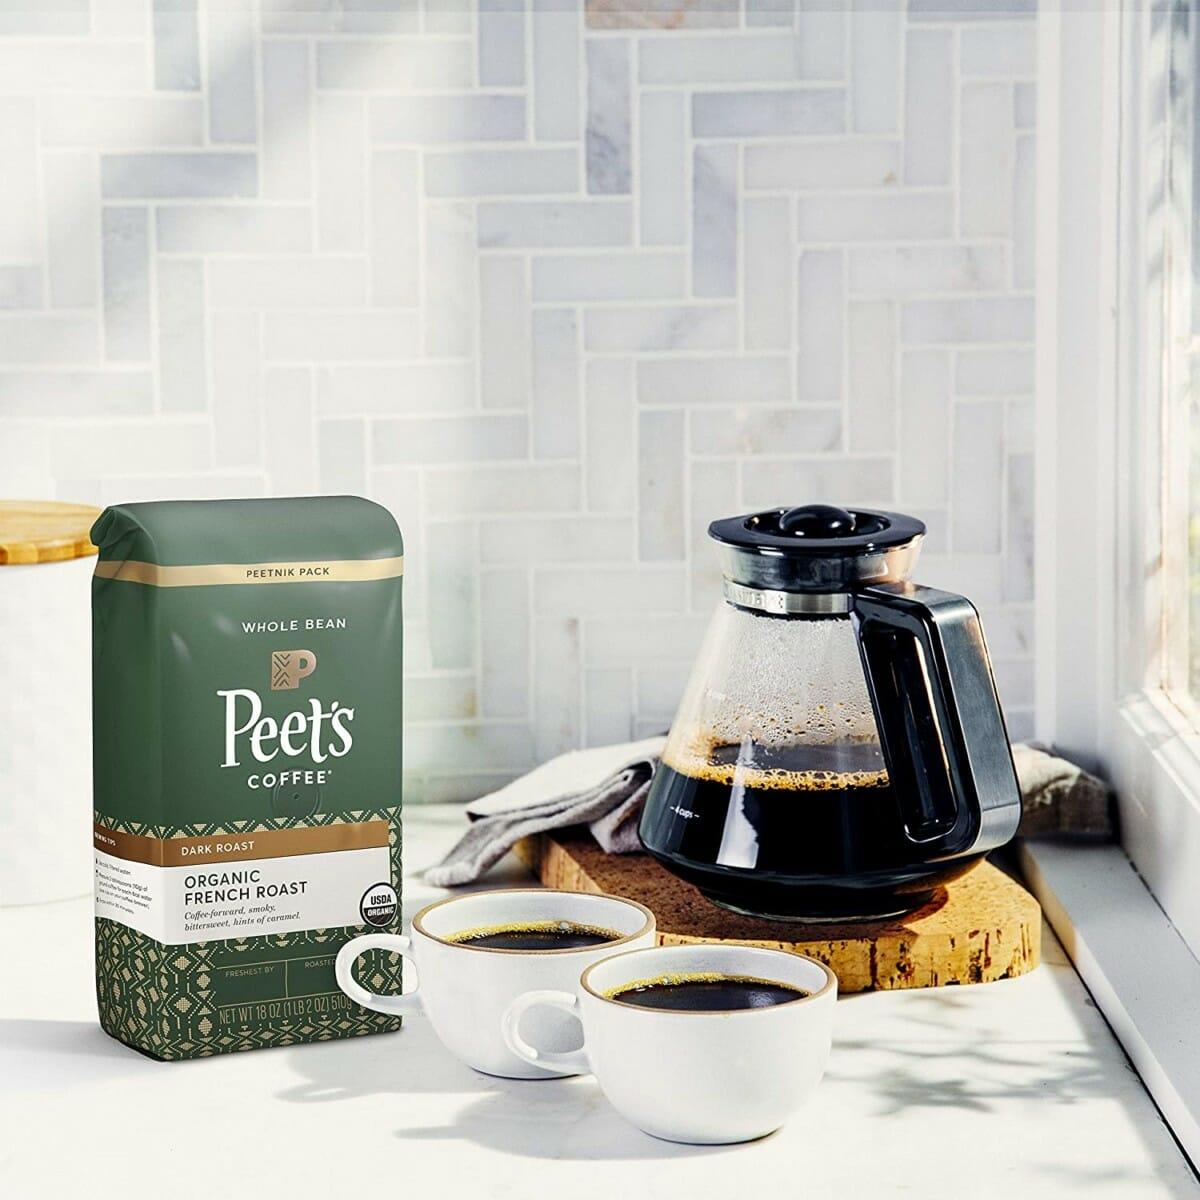 Peets Coffee1